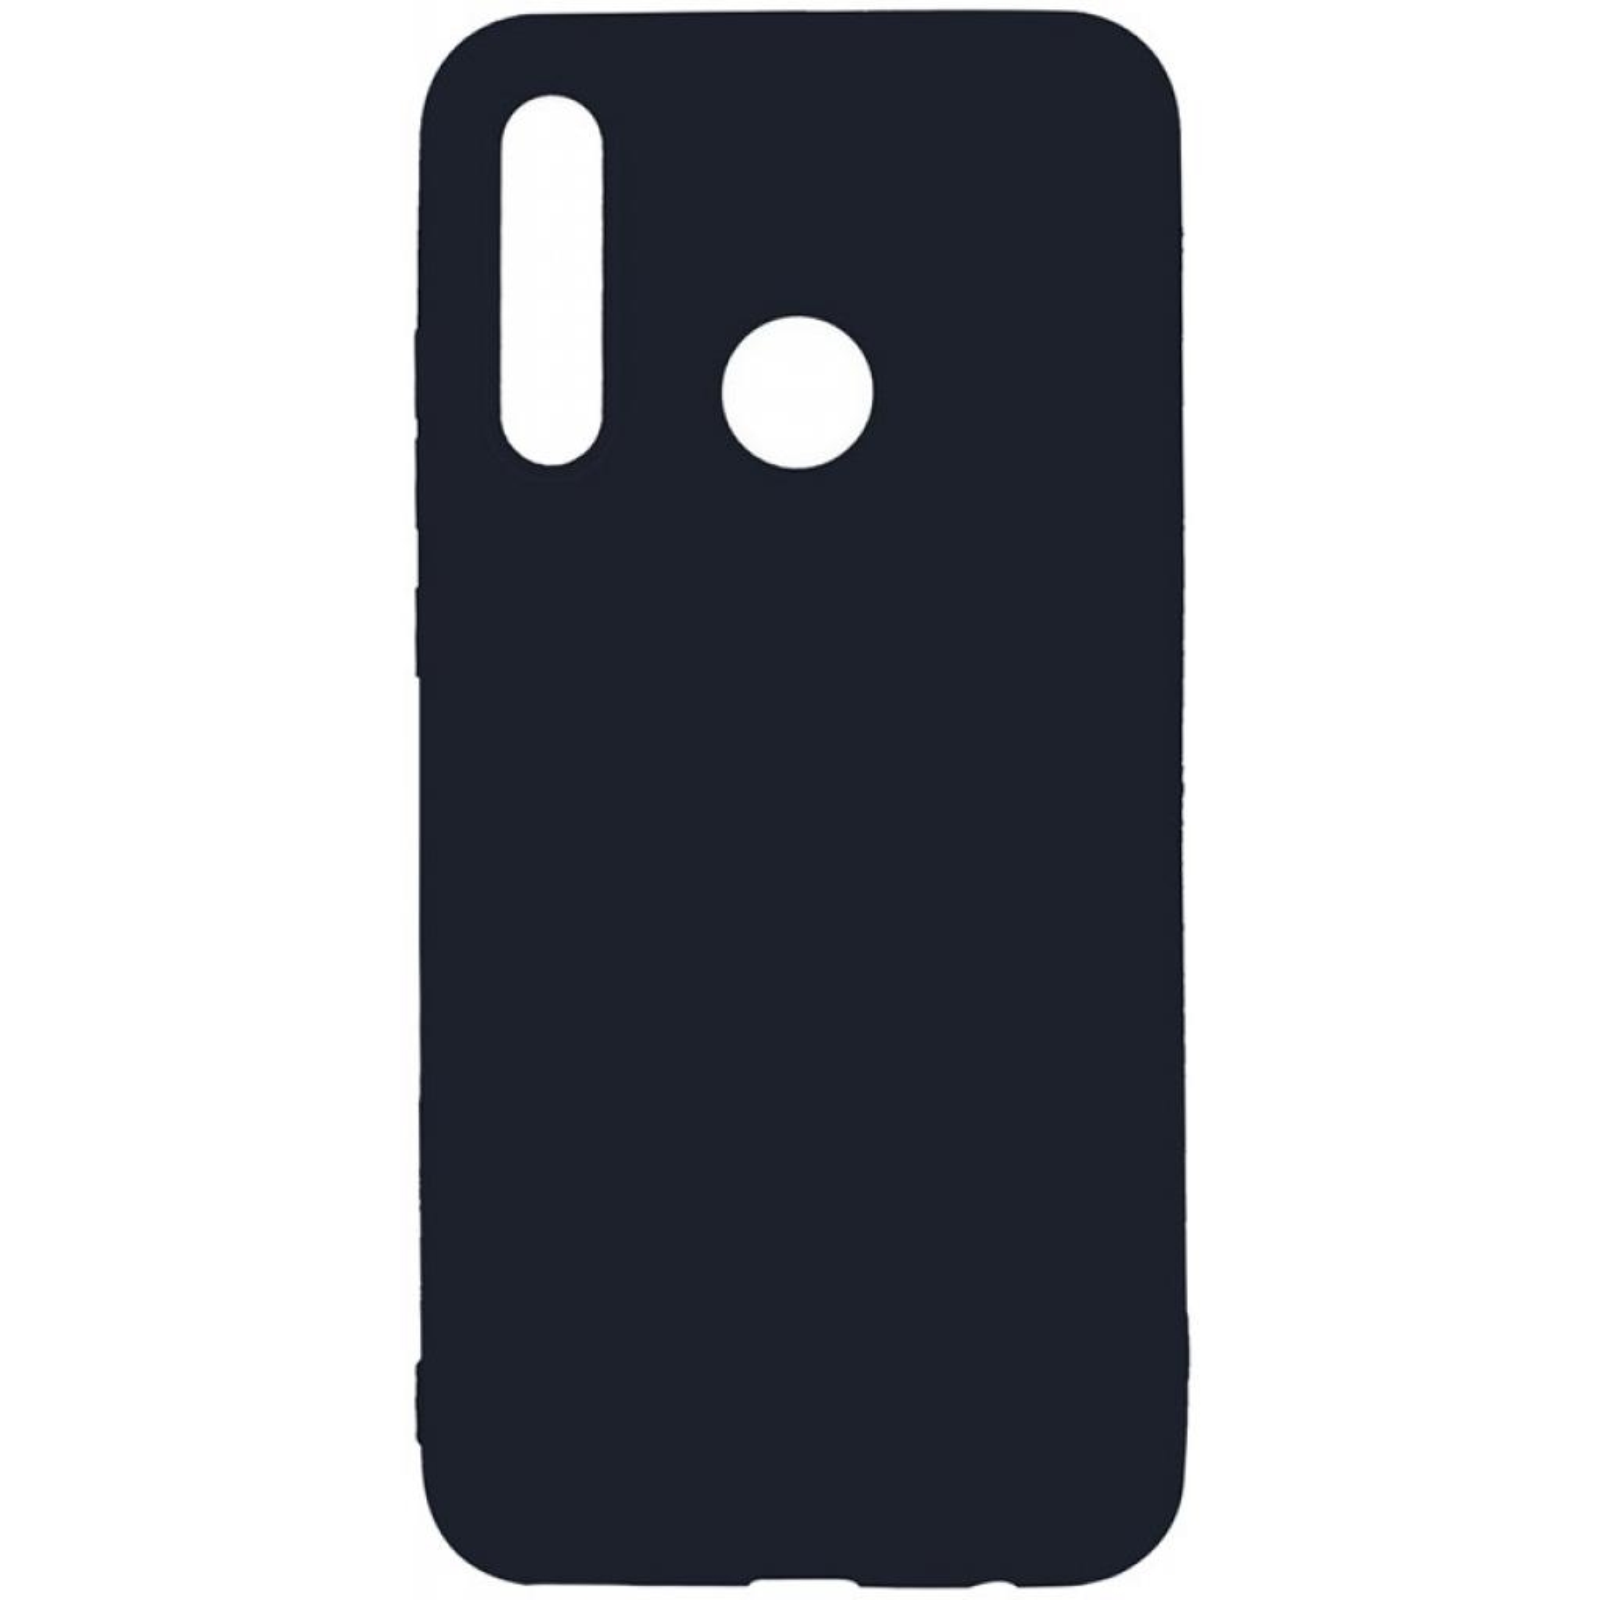 Чехол для моб. телефона Toto 1mm Matt TPU Case Honor 10 Lite Black (F_93939)